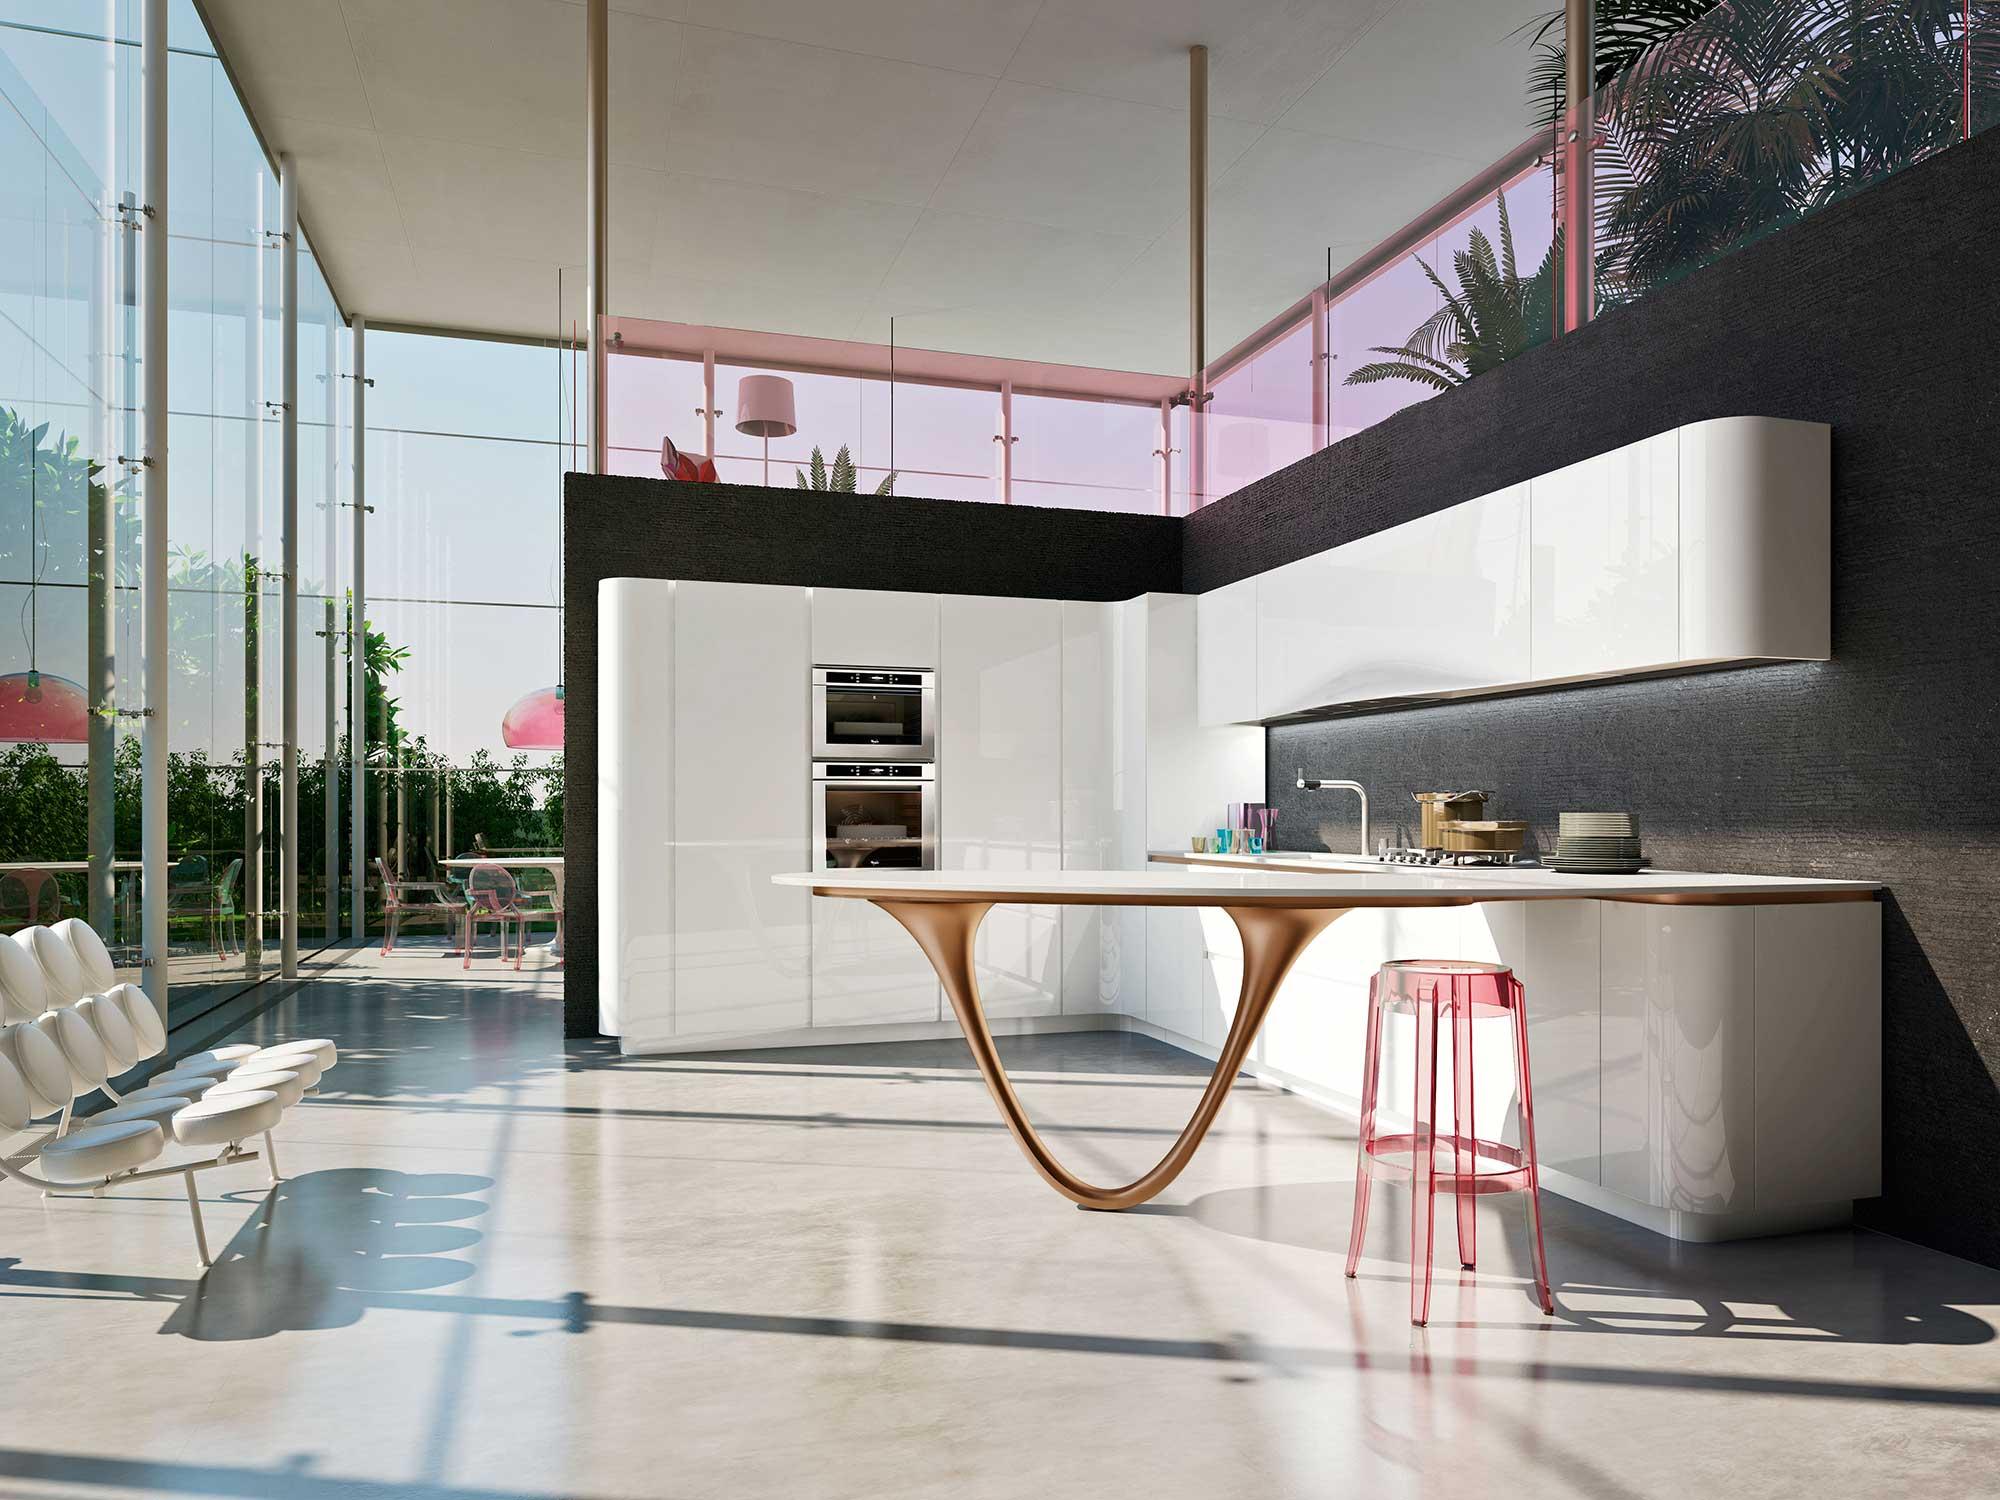 Ideas y dise o de cocinas modernas construye hogar for Diseno cocinas uruguay